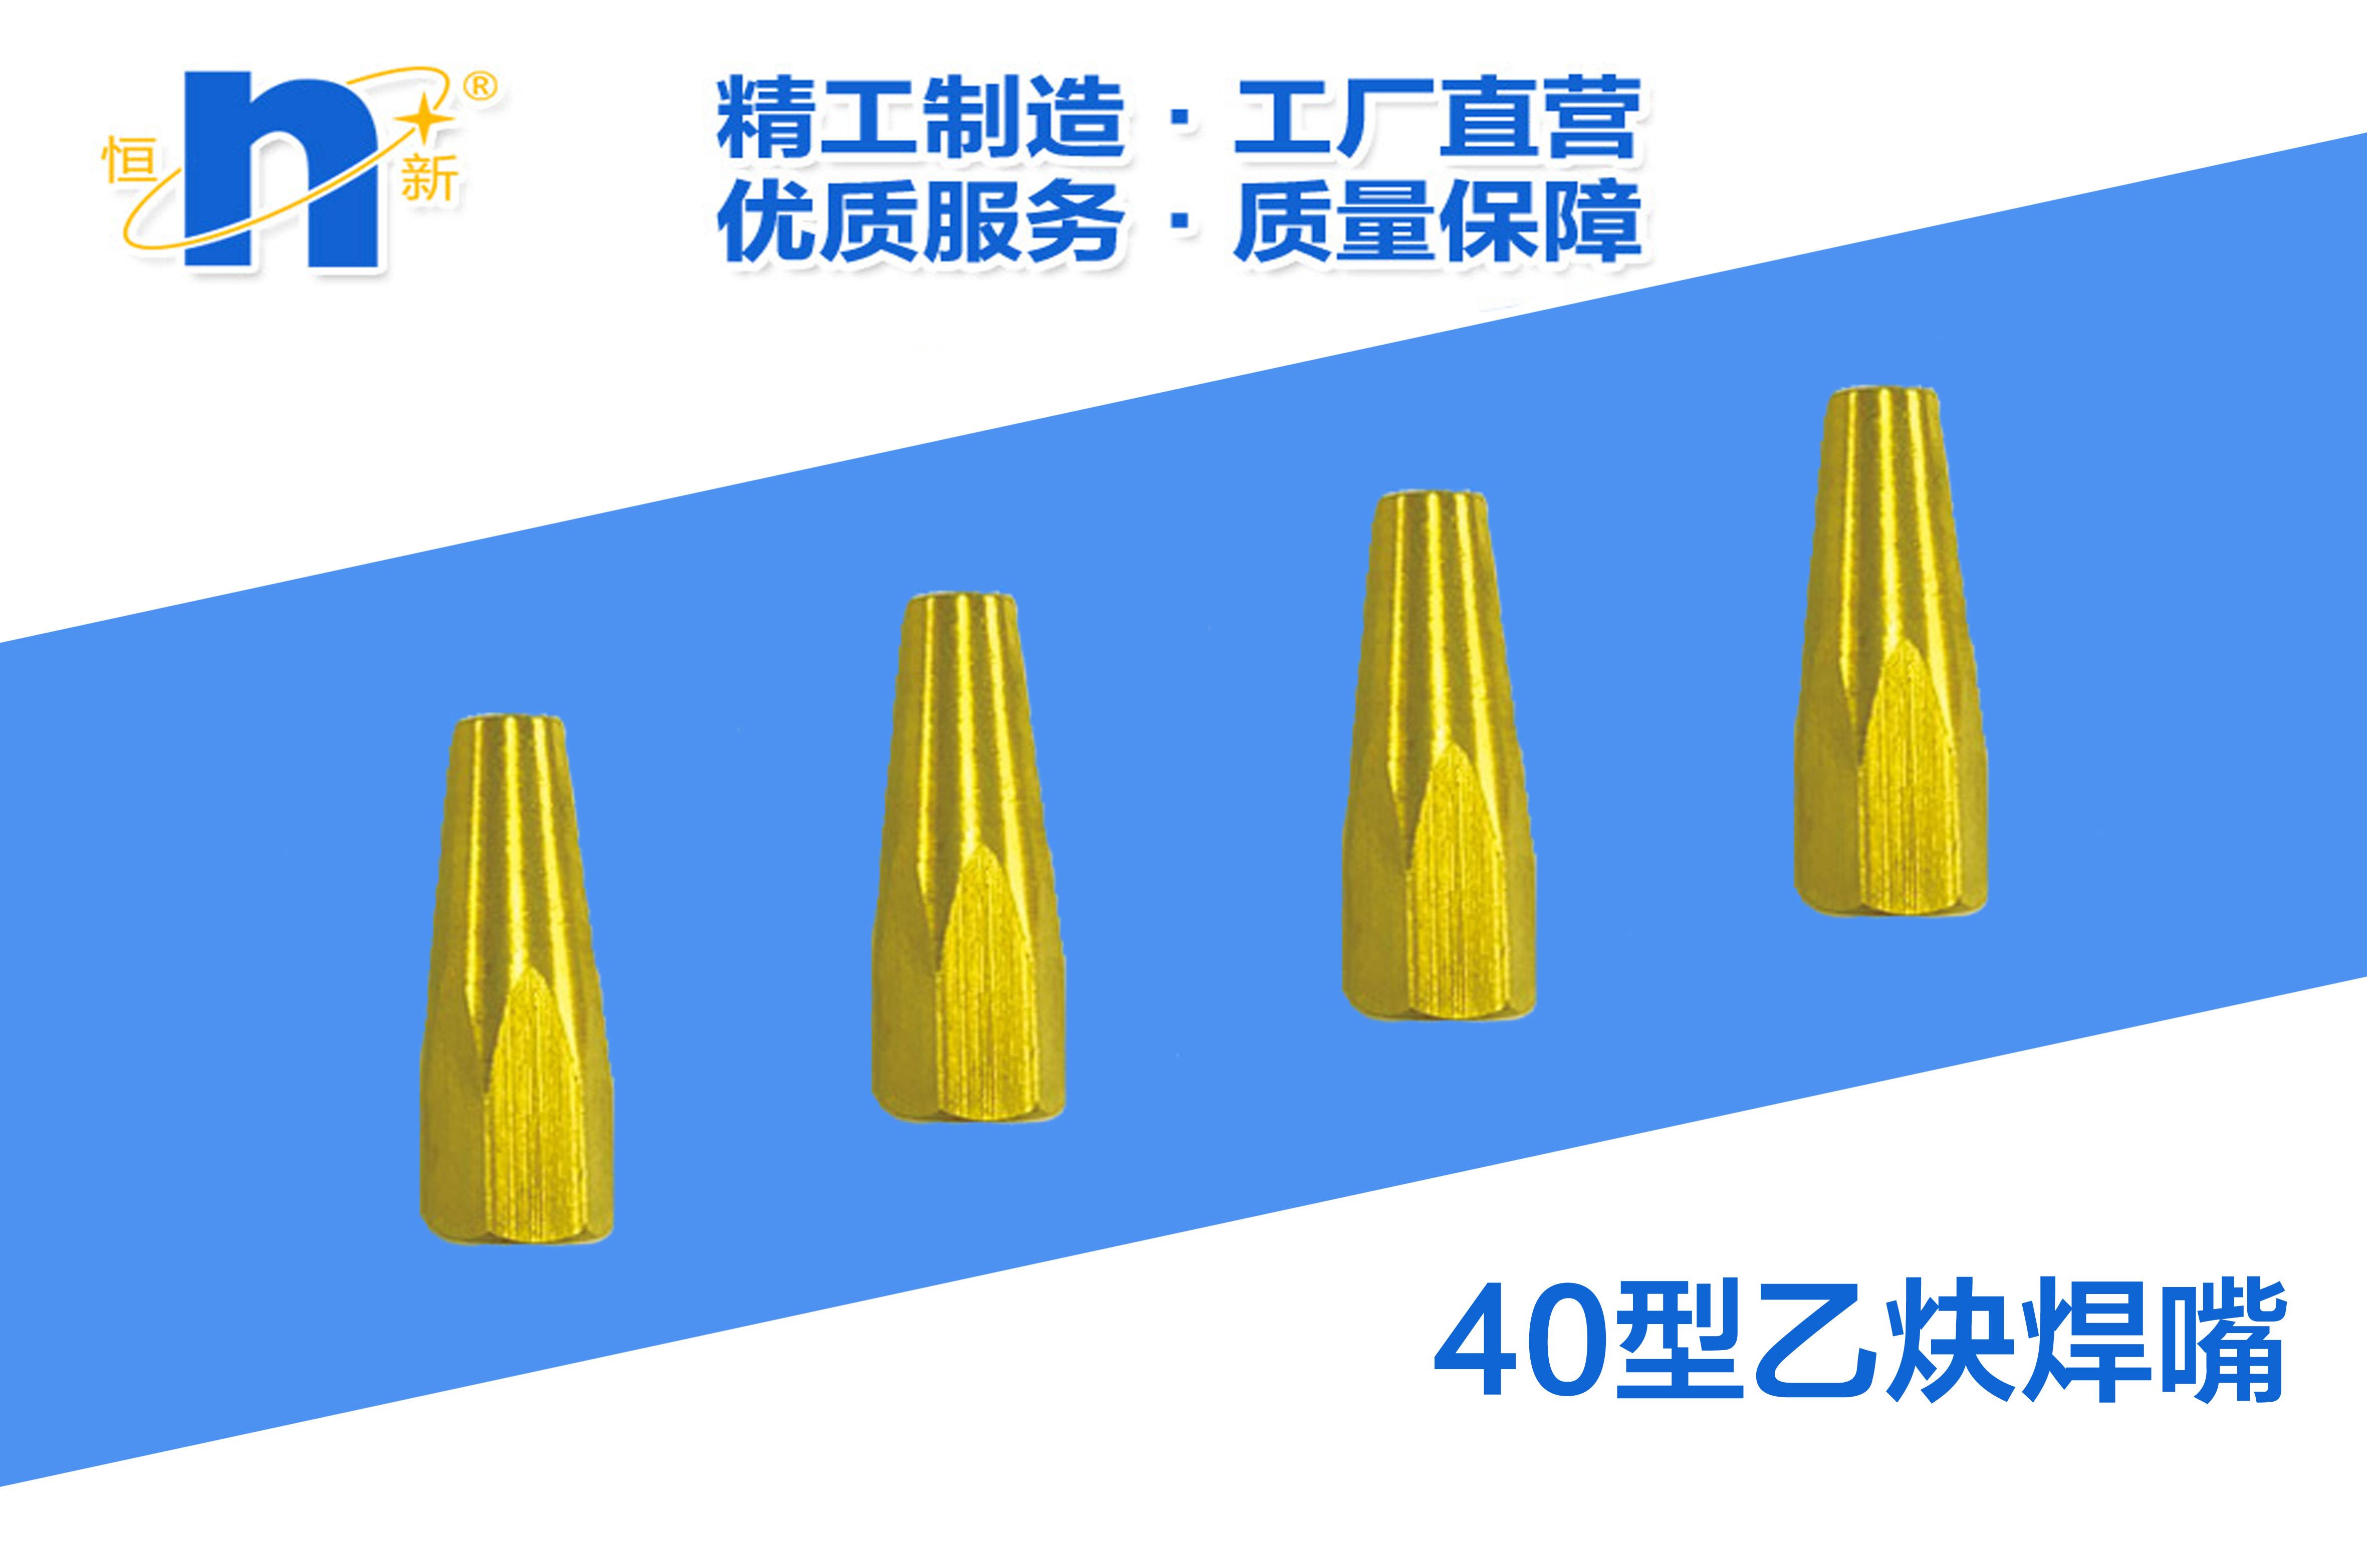 40型乙炔焊嘴